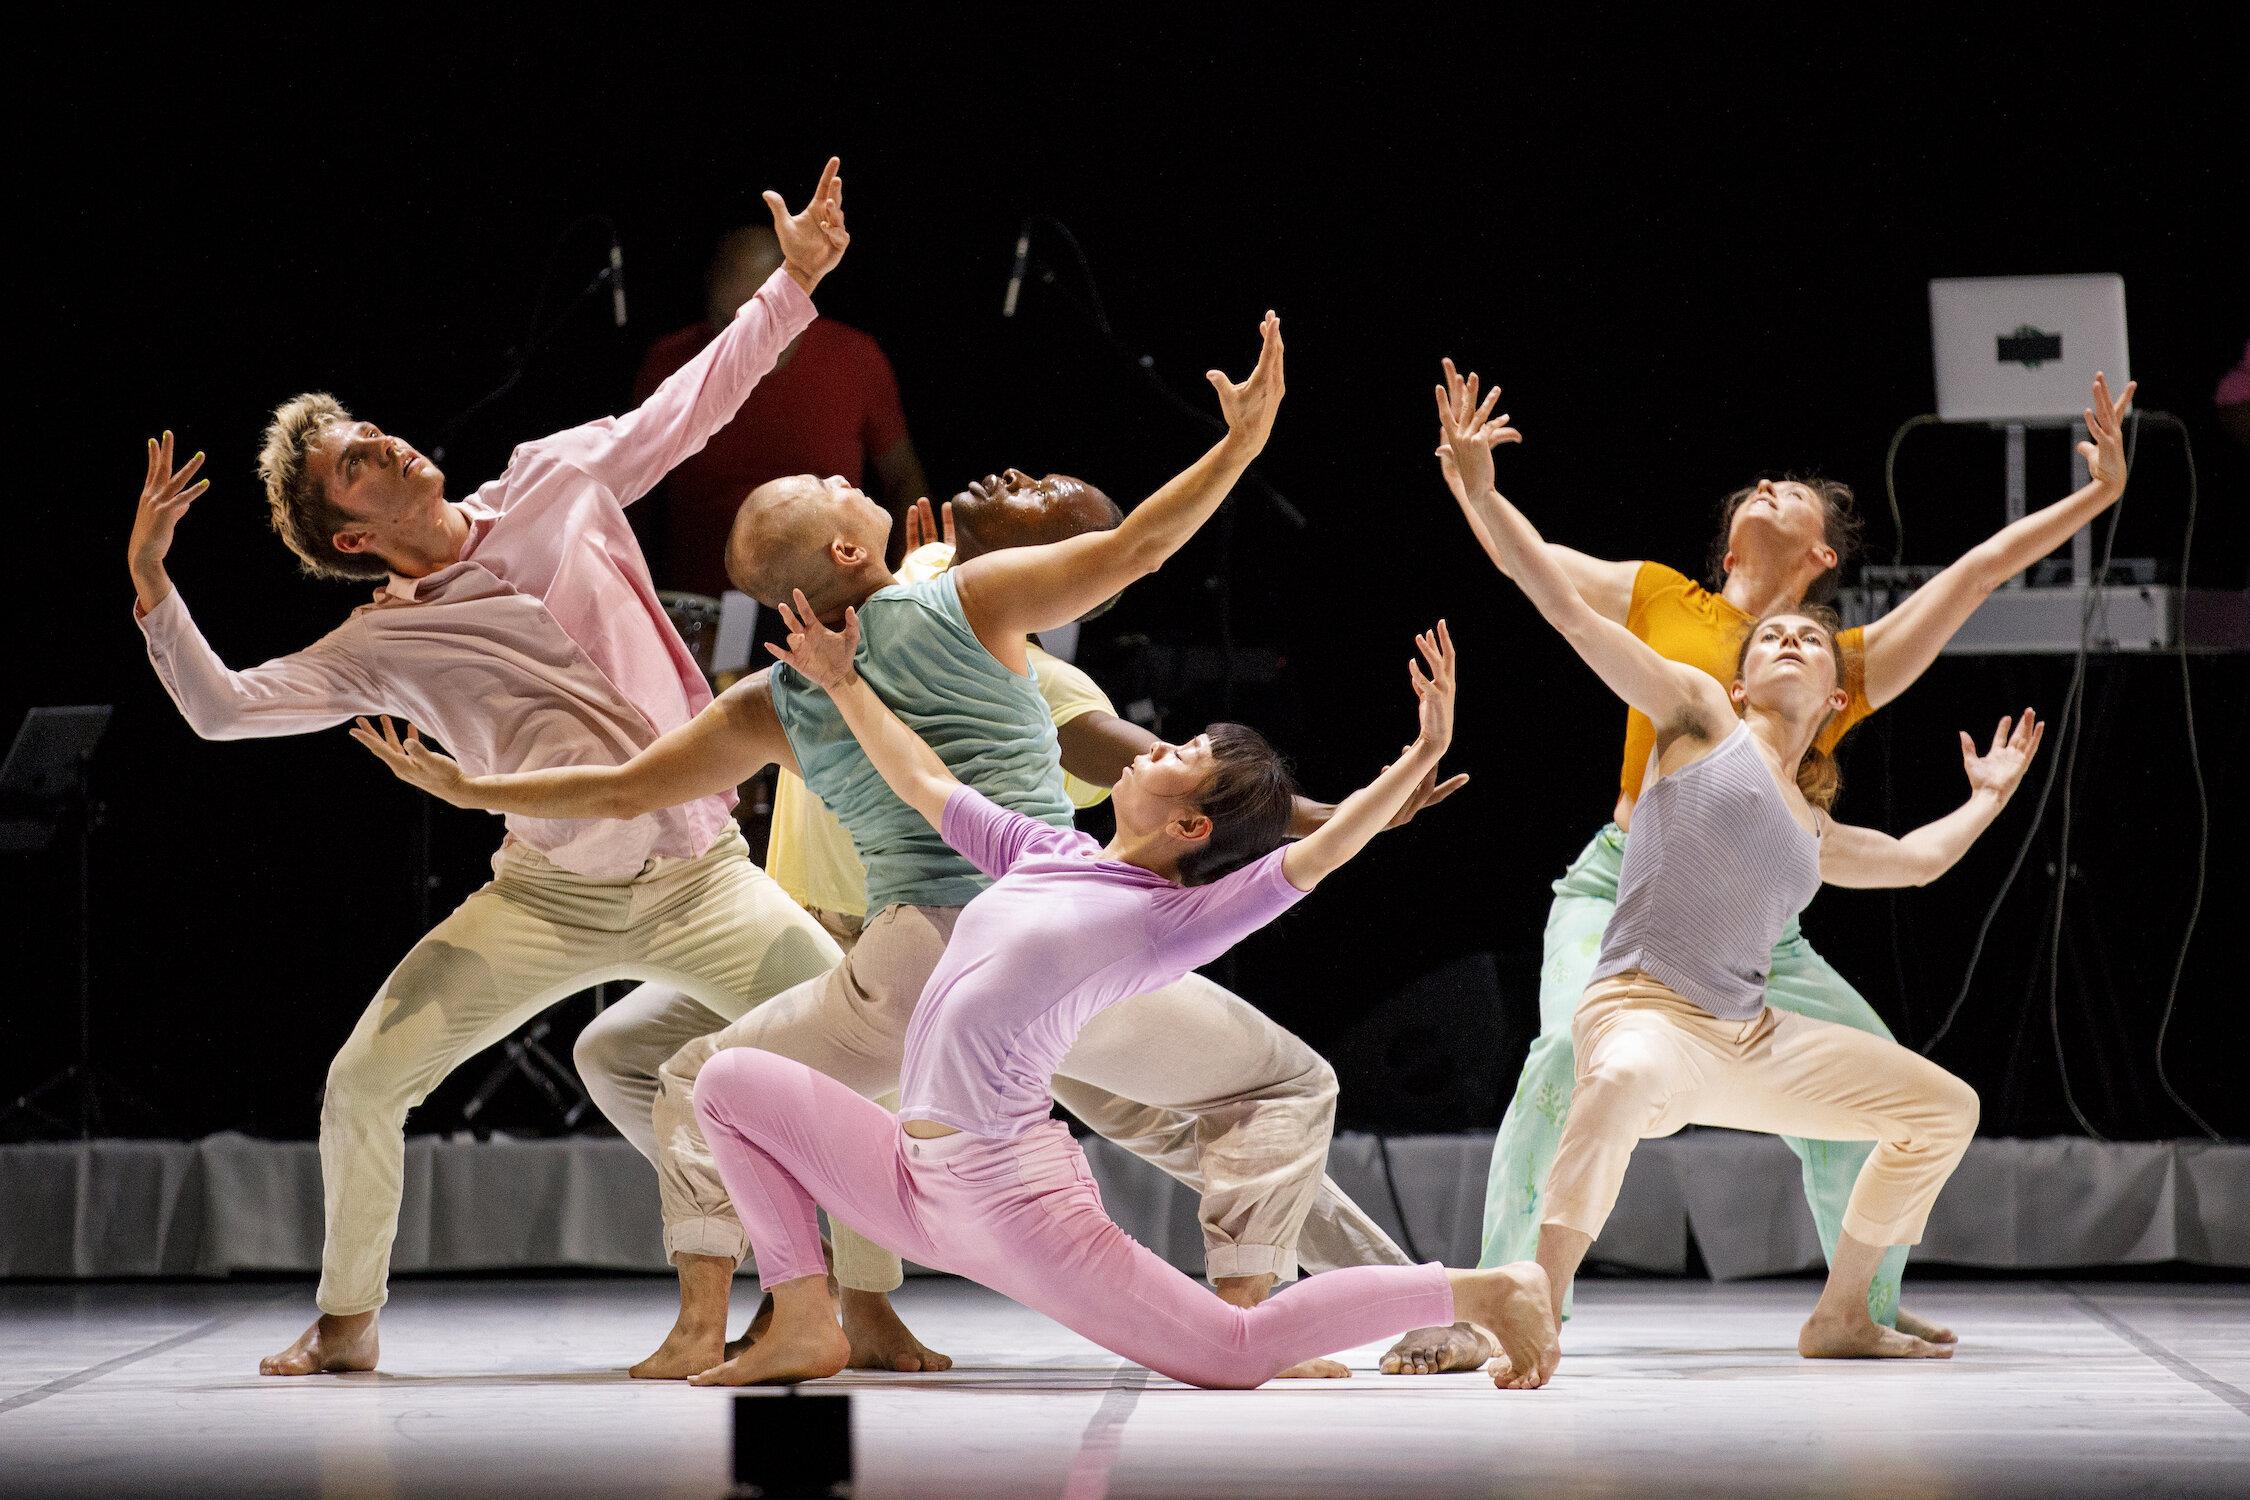 Toronto Dance Theatre - GH 5.0 by Hanna Kiel - Photo by Omer Yukseker